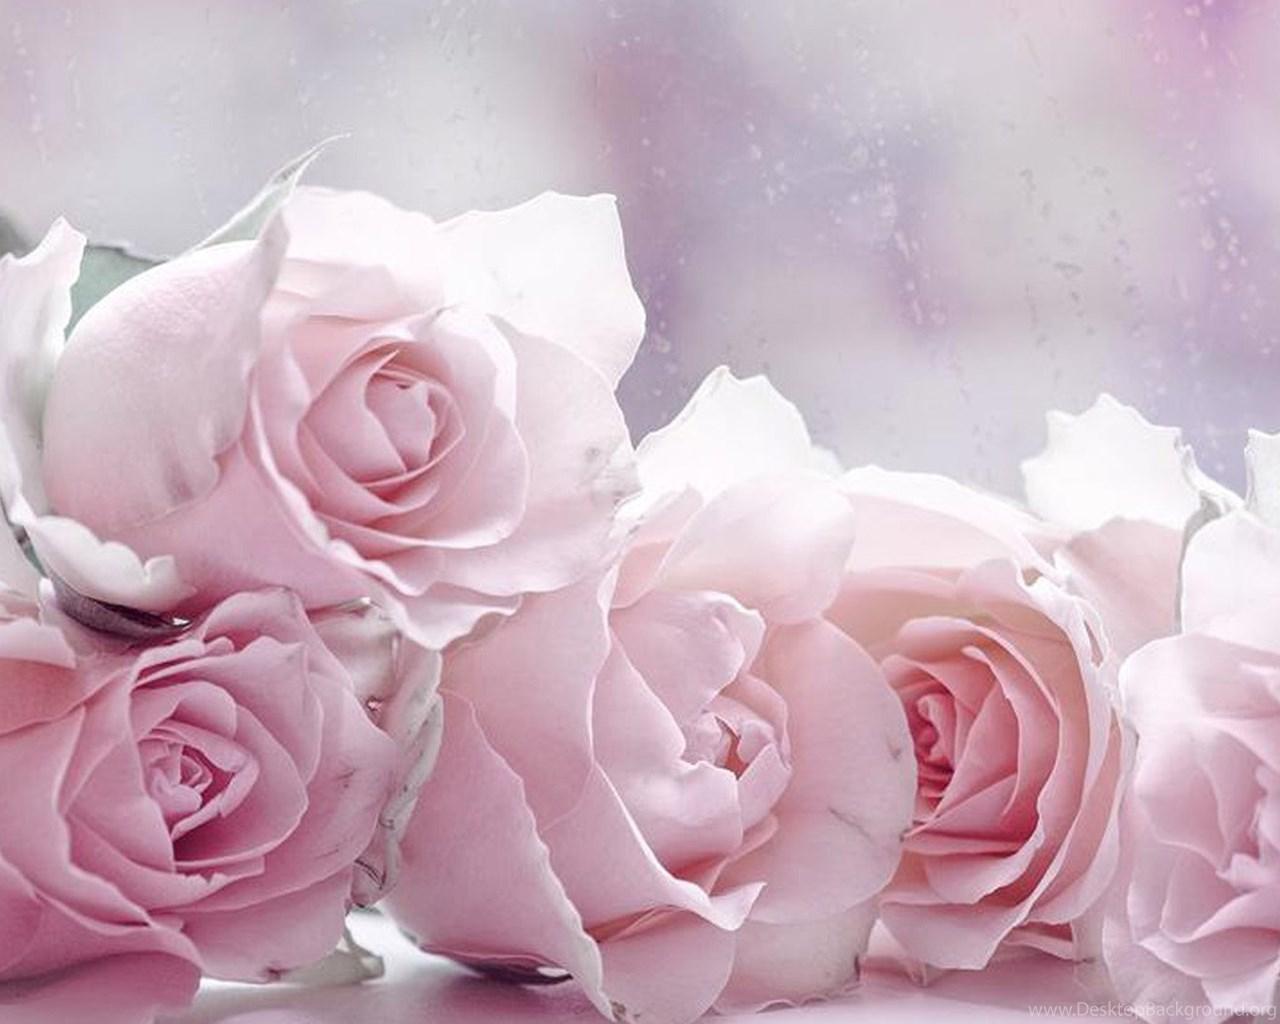 The Four Pastel Roses Wallpapers Rose Flower Images Rose Desktop Background